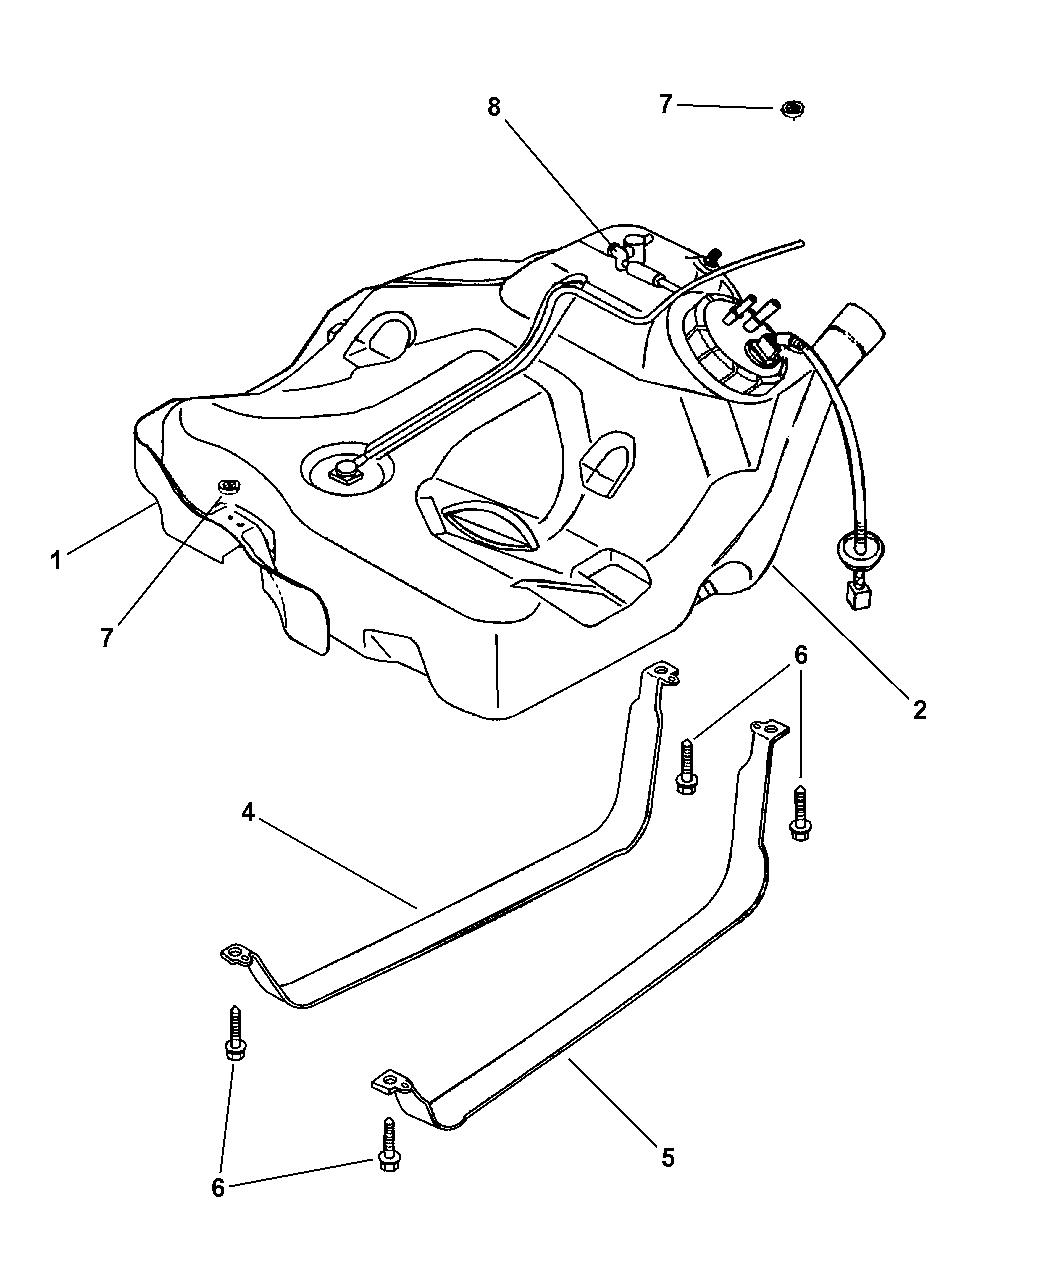 Genuine Chrysler STRAP-FUEL TANK